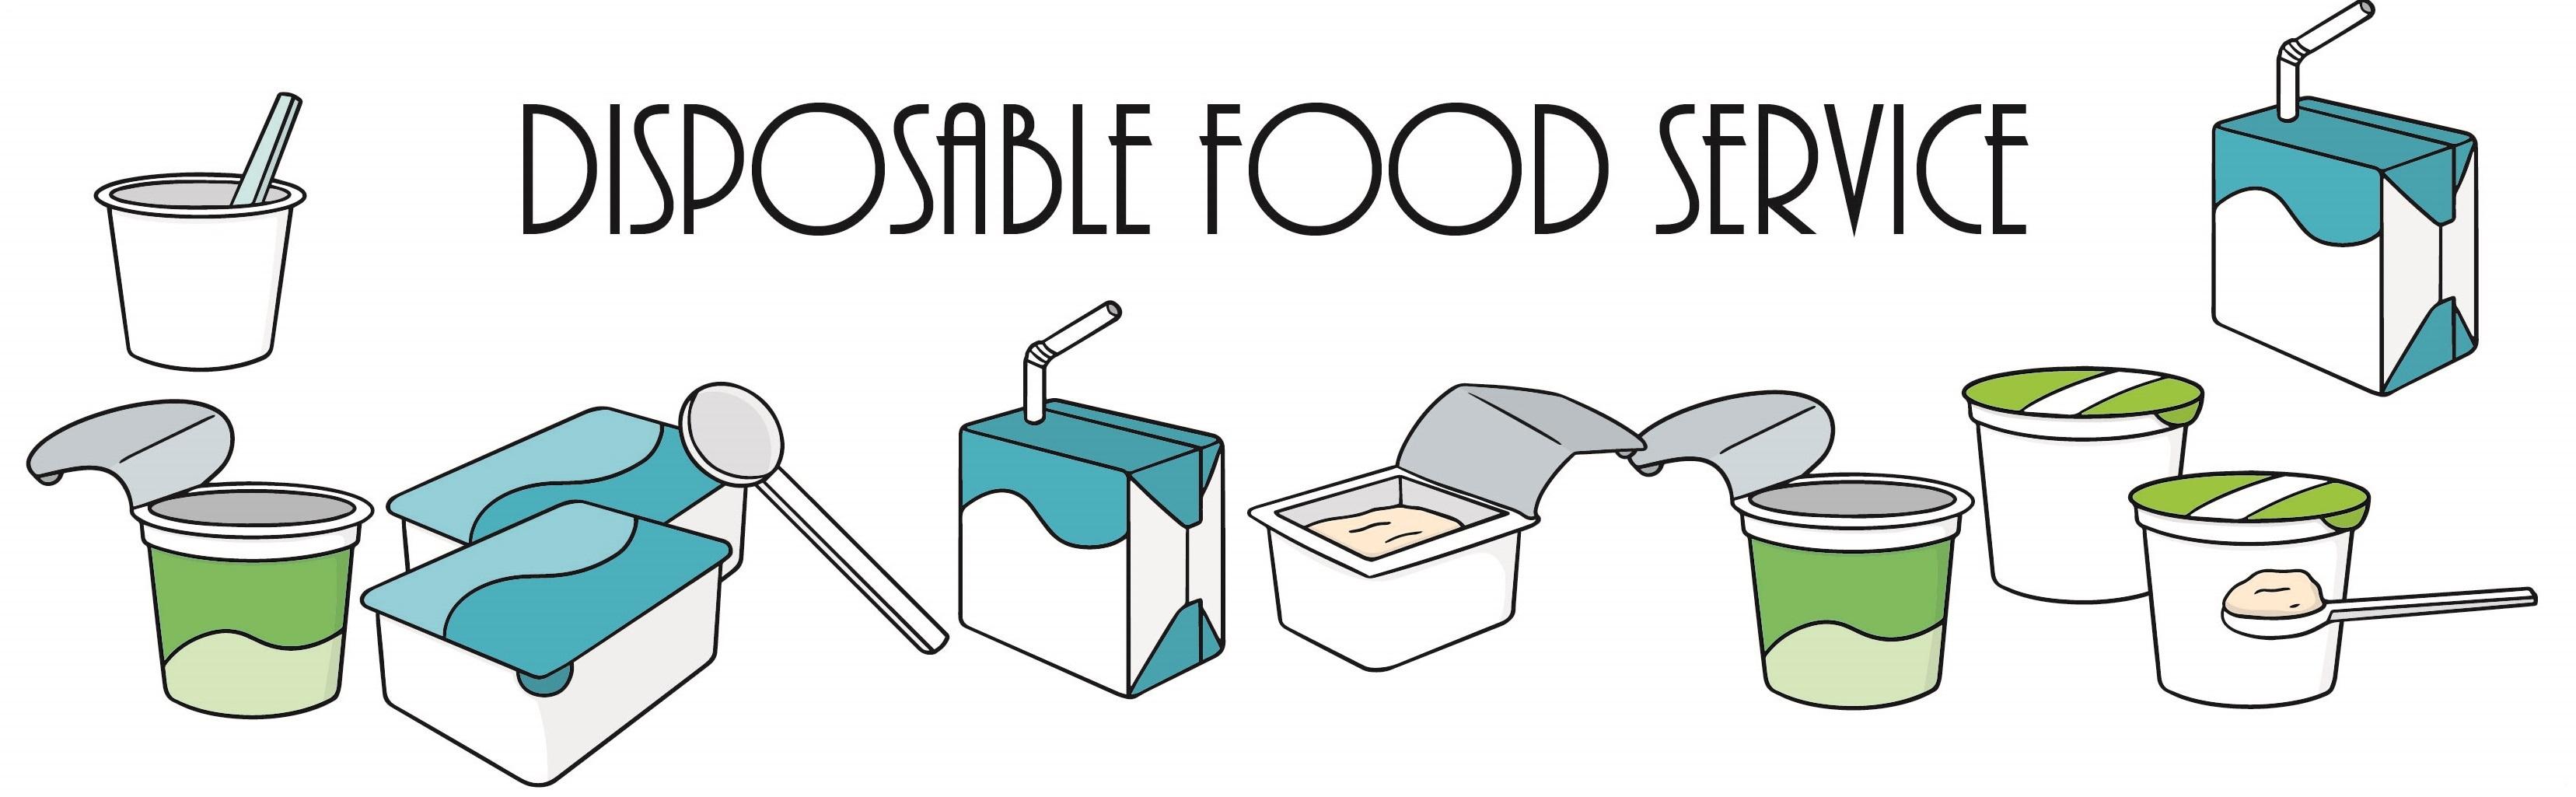 Deposible Food Supplies